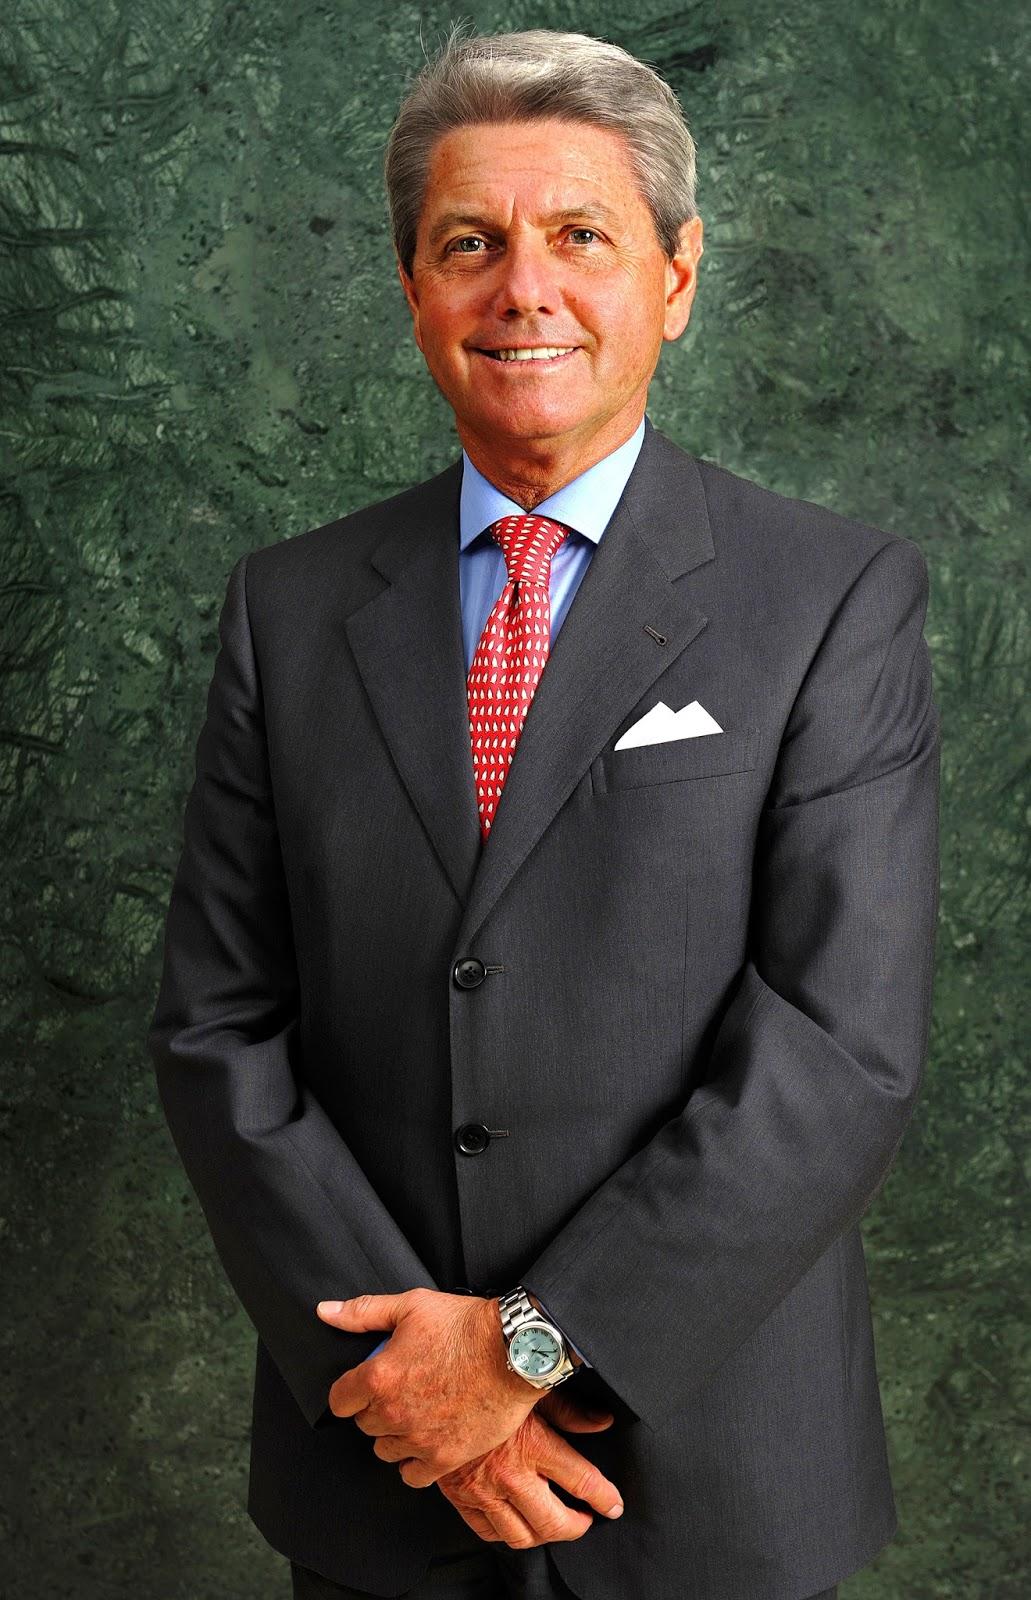 Gian-Riccardo-Marini-CEO-of-Rolex-2013.j